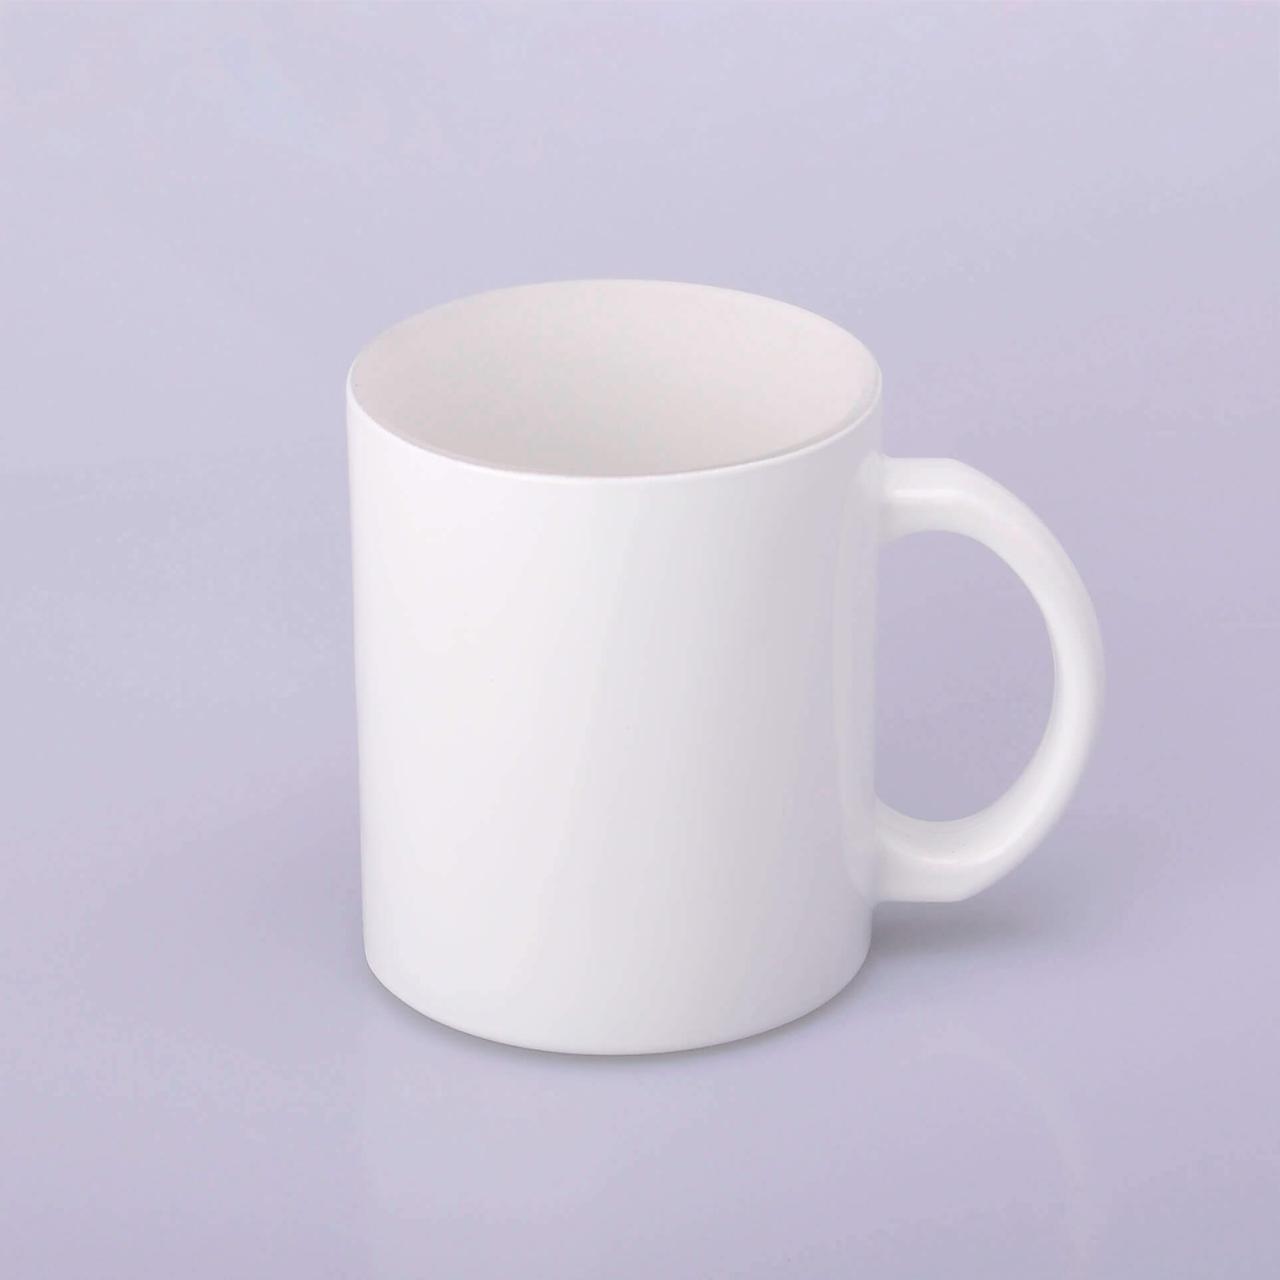 Чашка для сублимации стекло (белая) 330 мл